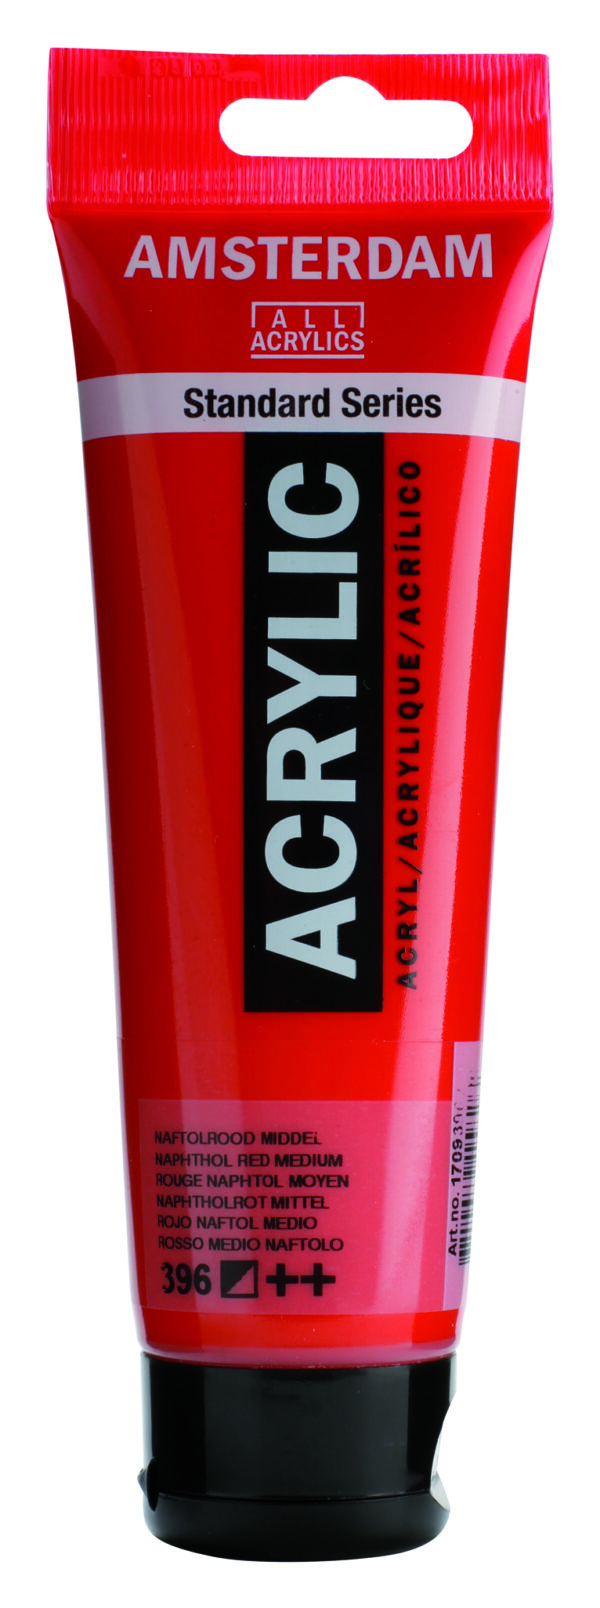 Ams std 396 Naphtol red Medium - 120 ml